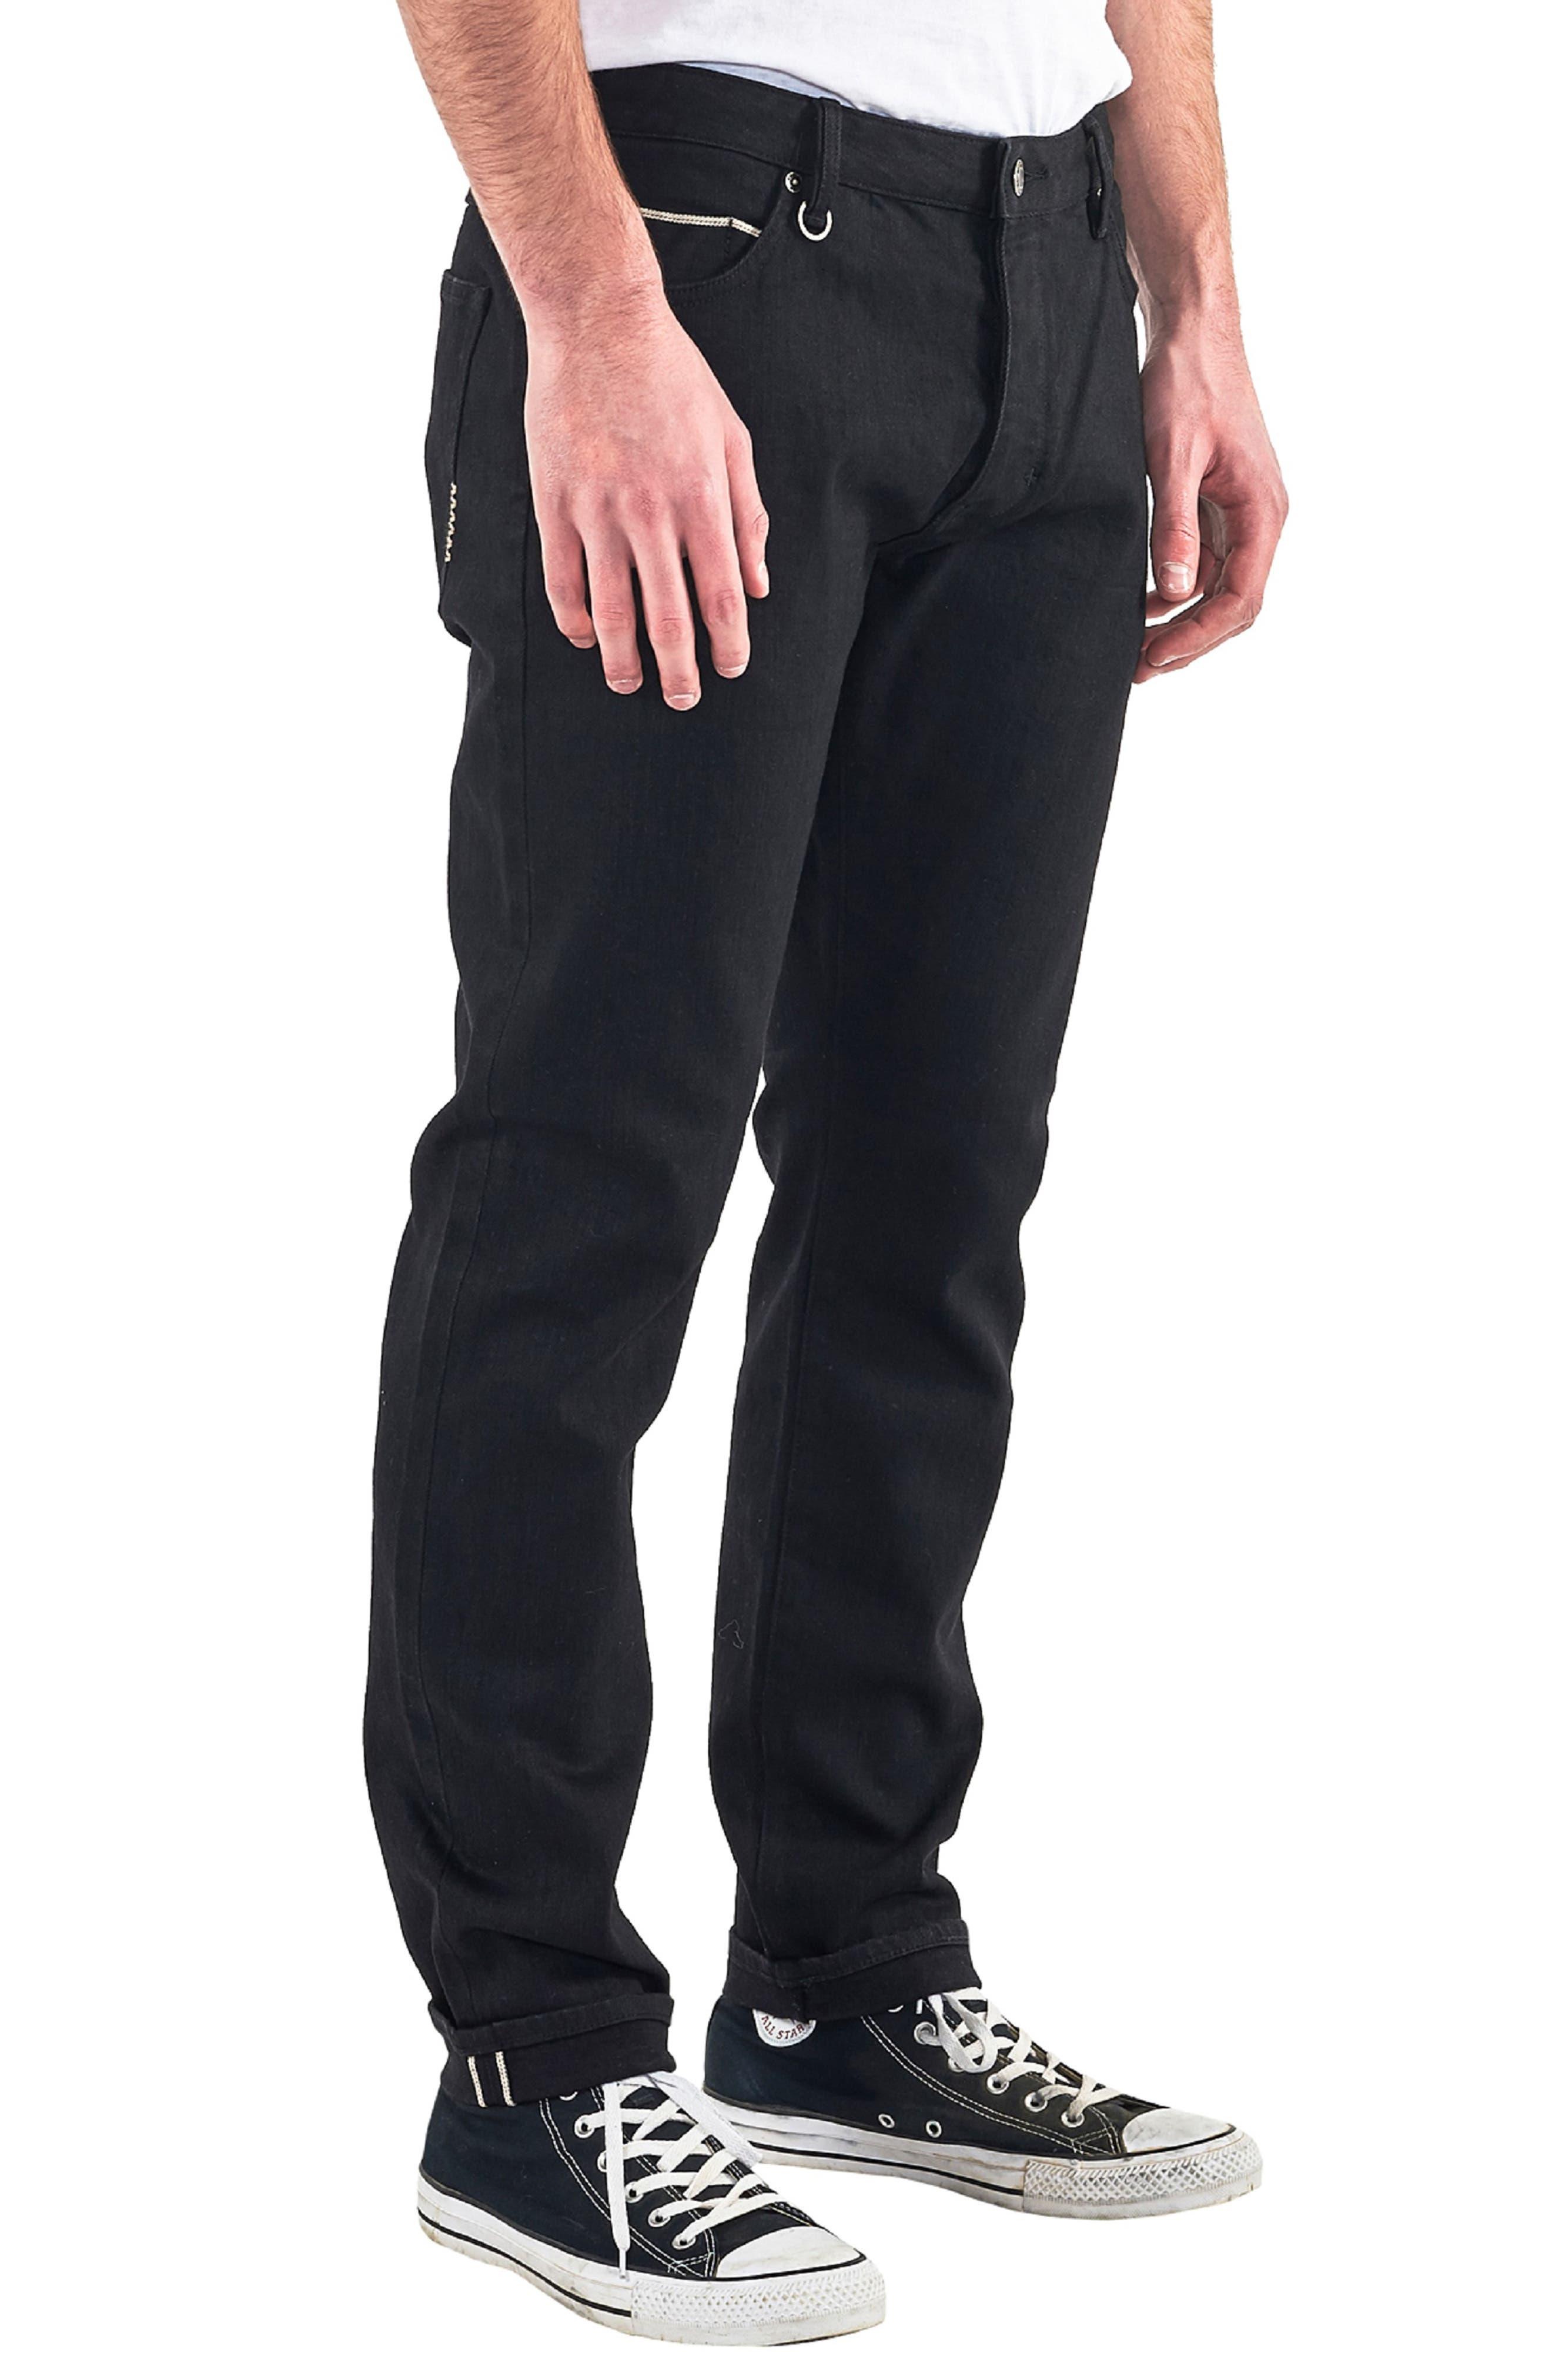 Lou Slim Fit Jeans,                             Alternate thumbnail 3, color,                             BLACK SELVEDGE